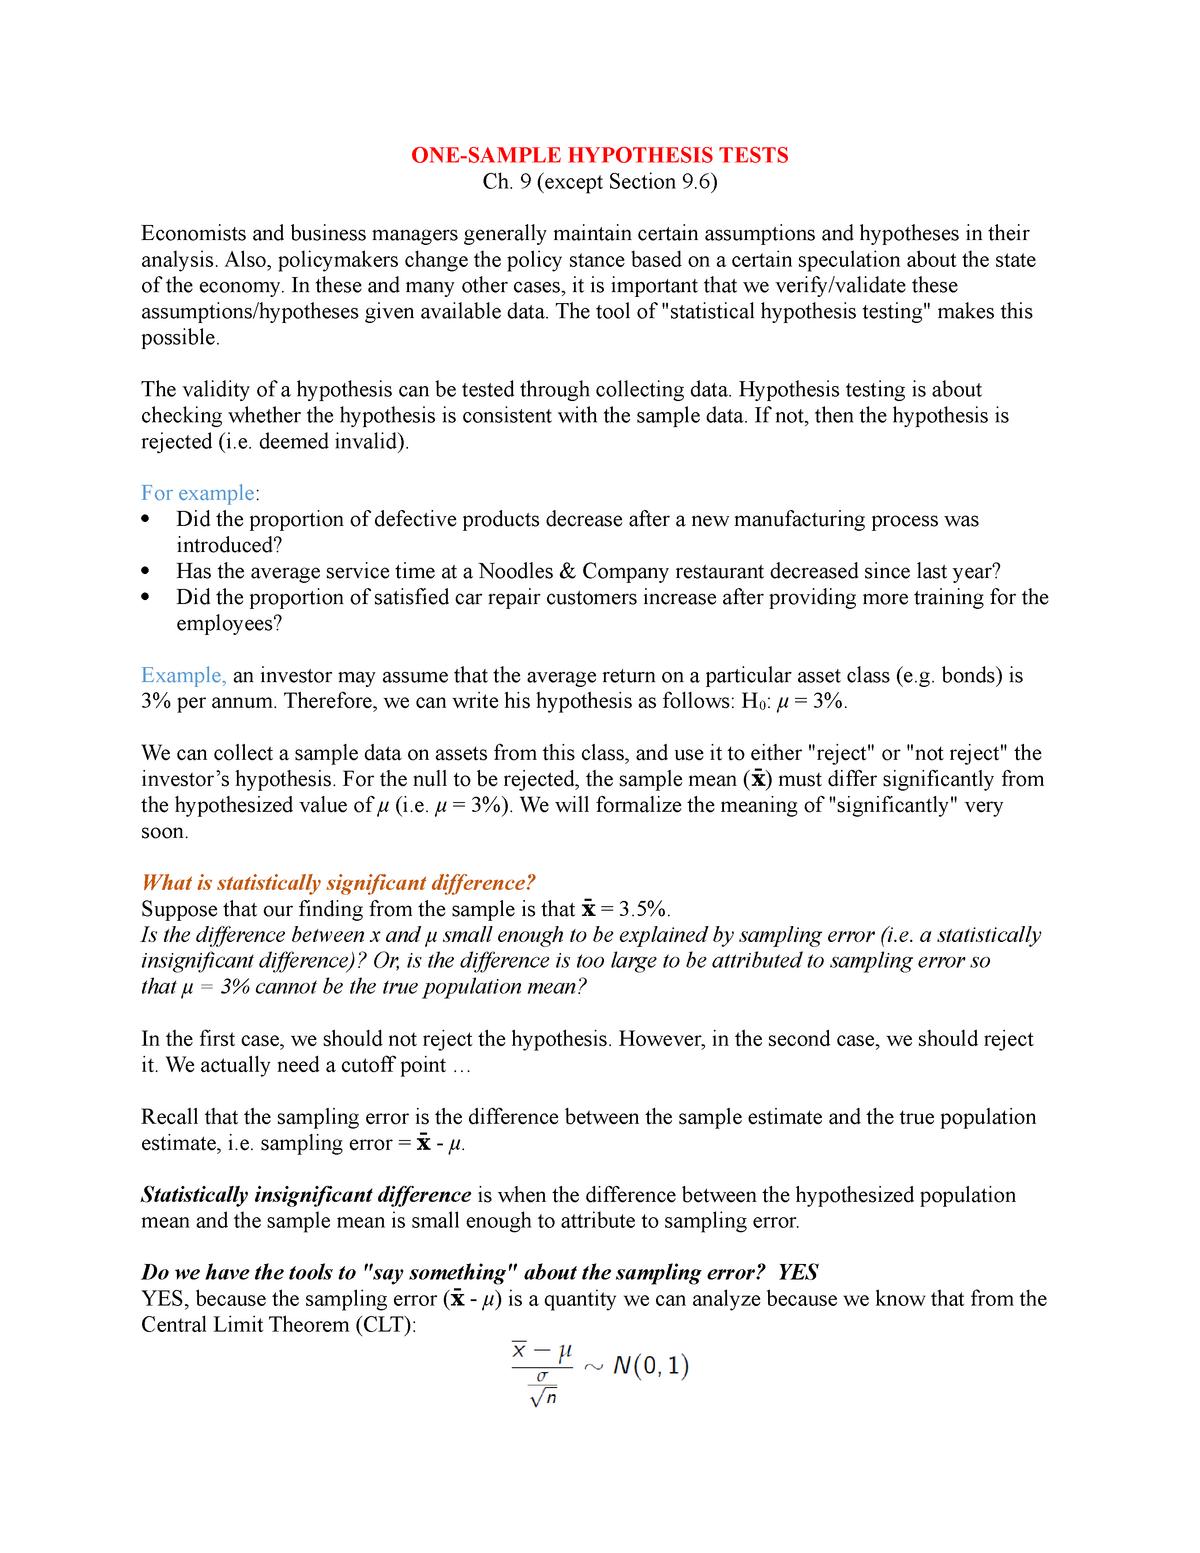 Econ 2081- Lecture 11 & 12 & 13 - One Sample Hypothesis - StuDocu